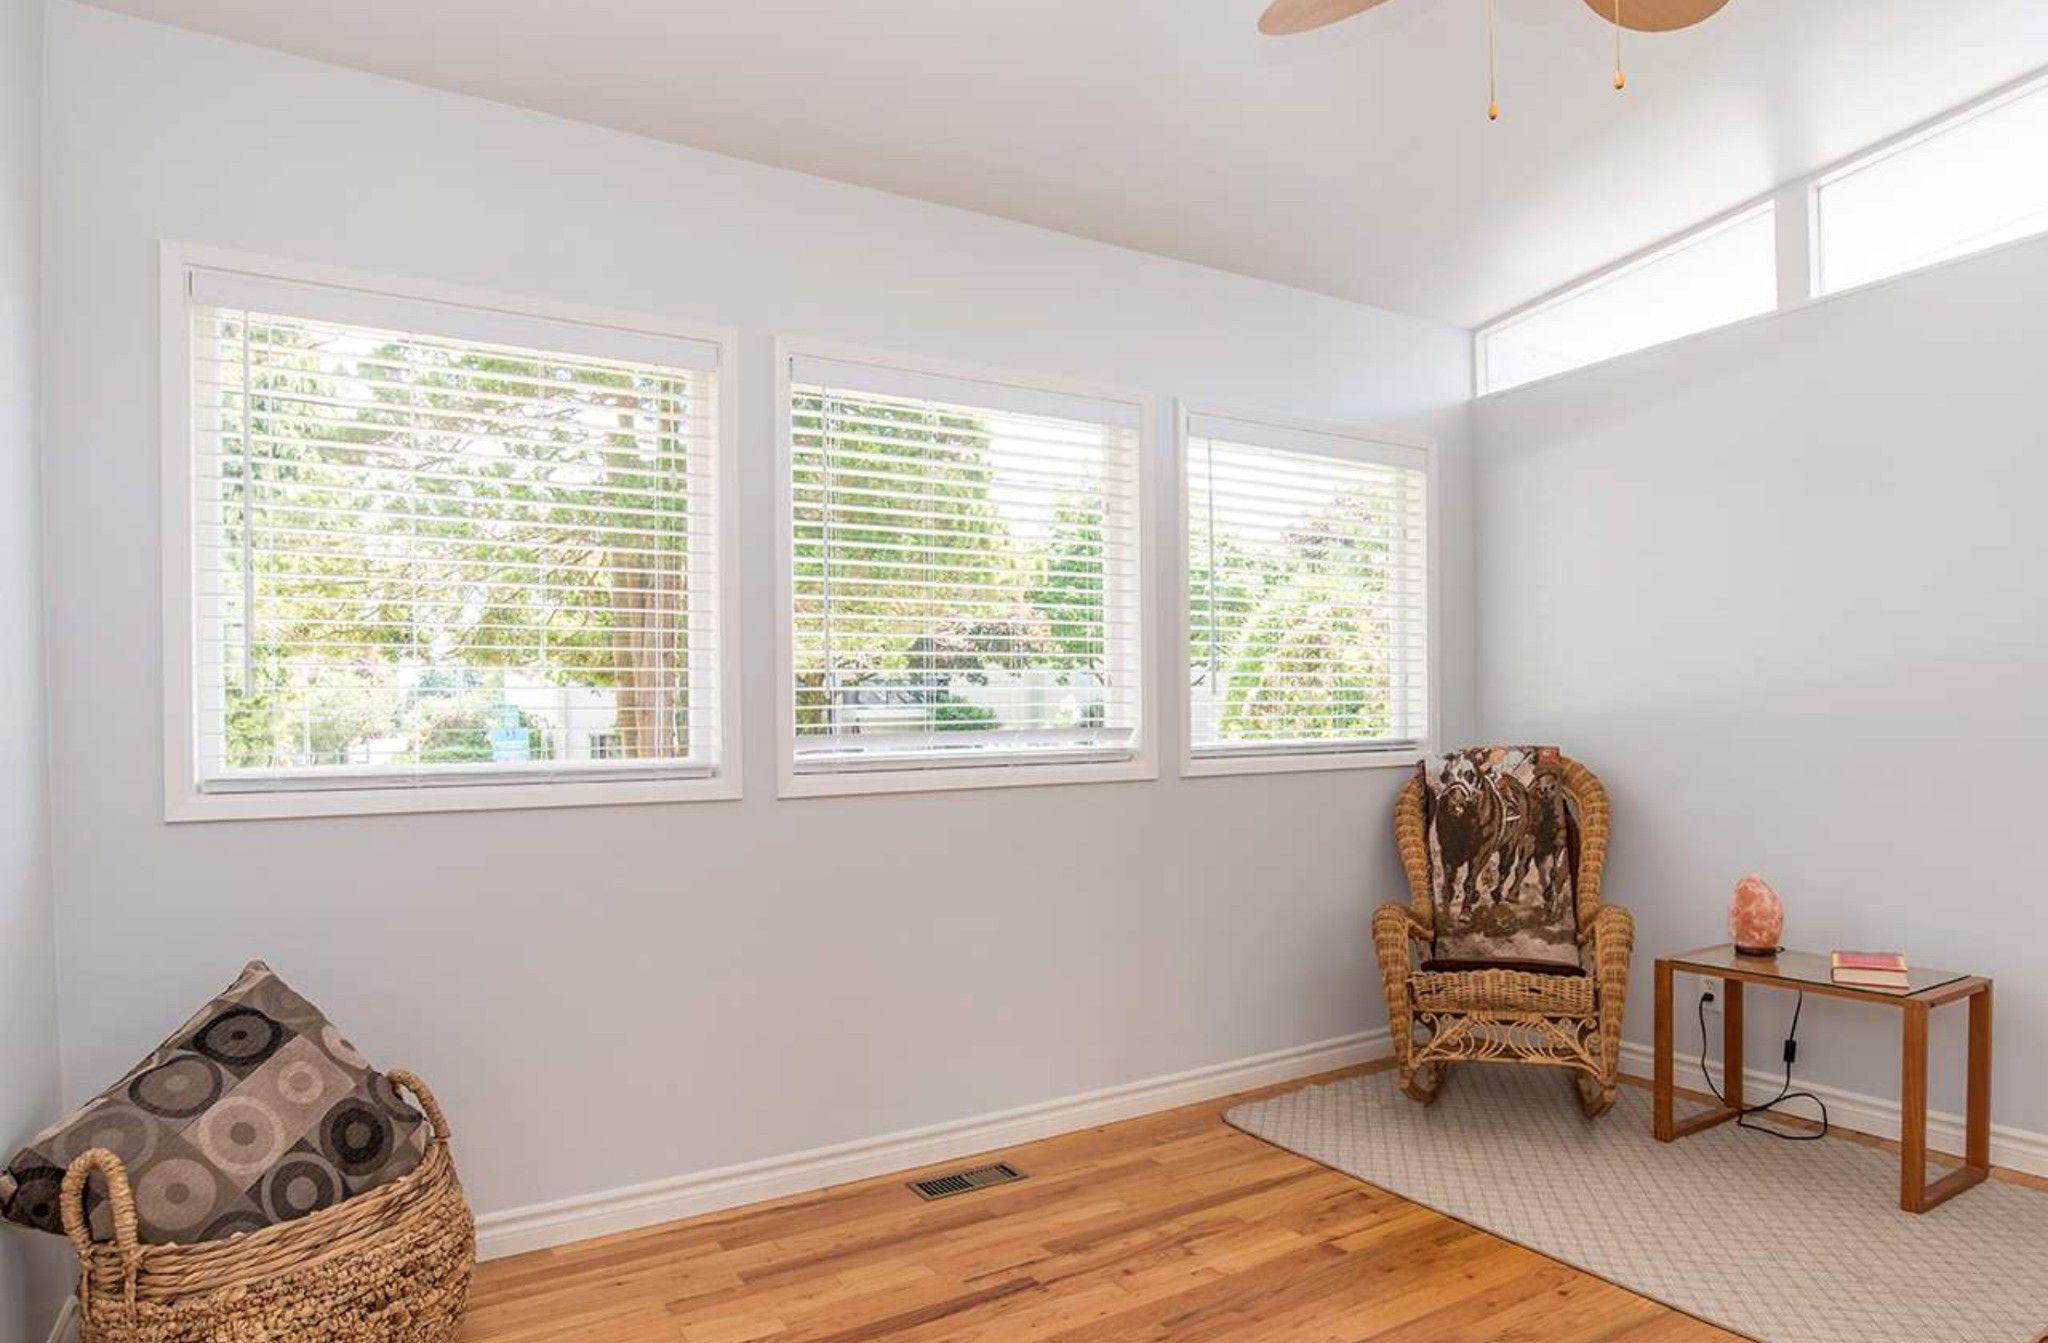 Photo 8: Photos: 10327 127A Street in Surrey: Cedar Hills House for sale : MLS®# R2178137